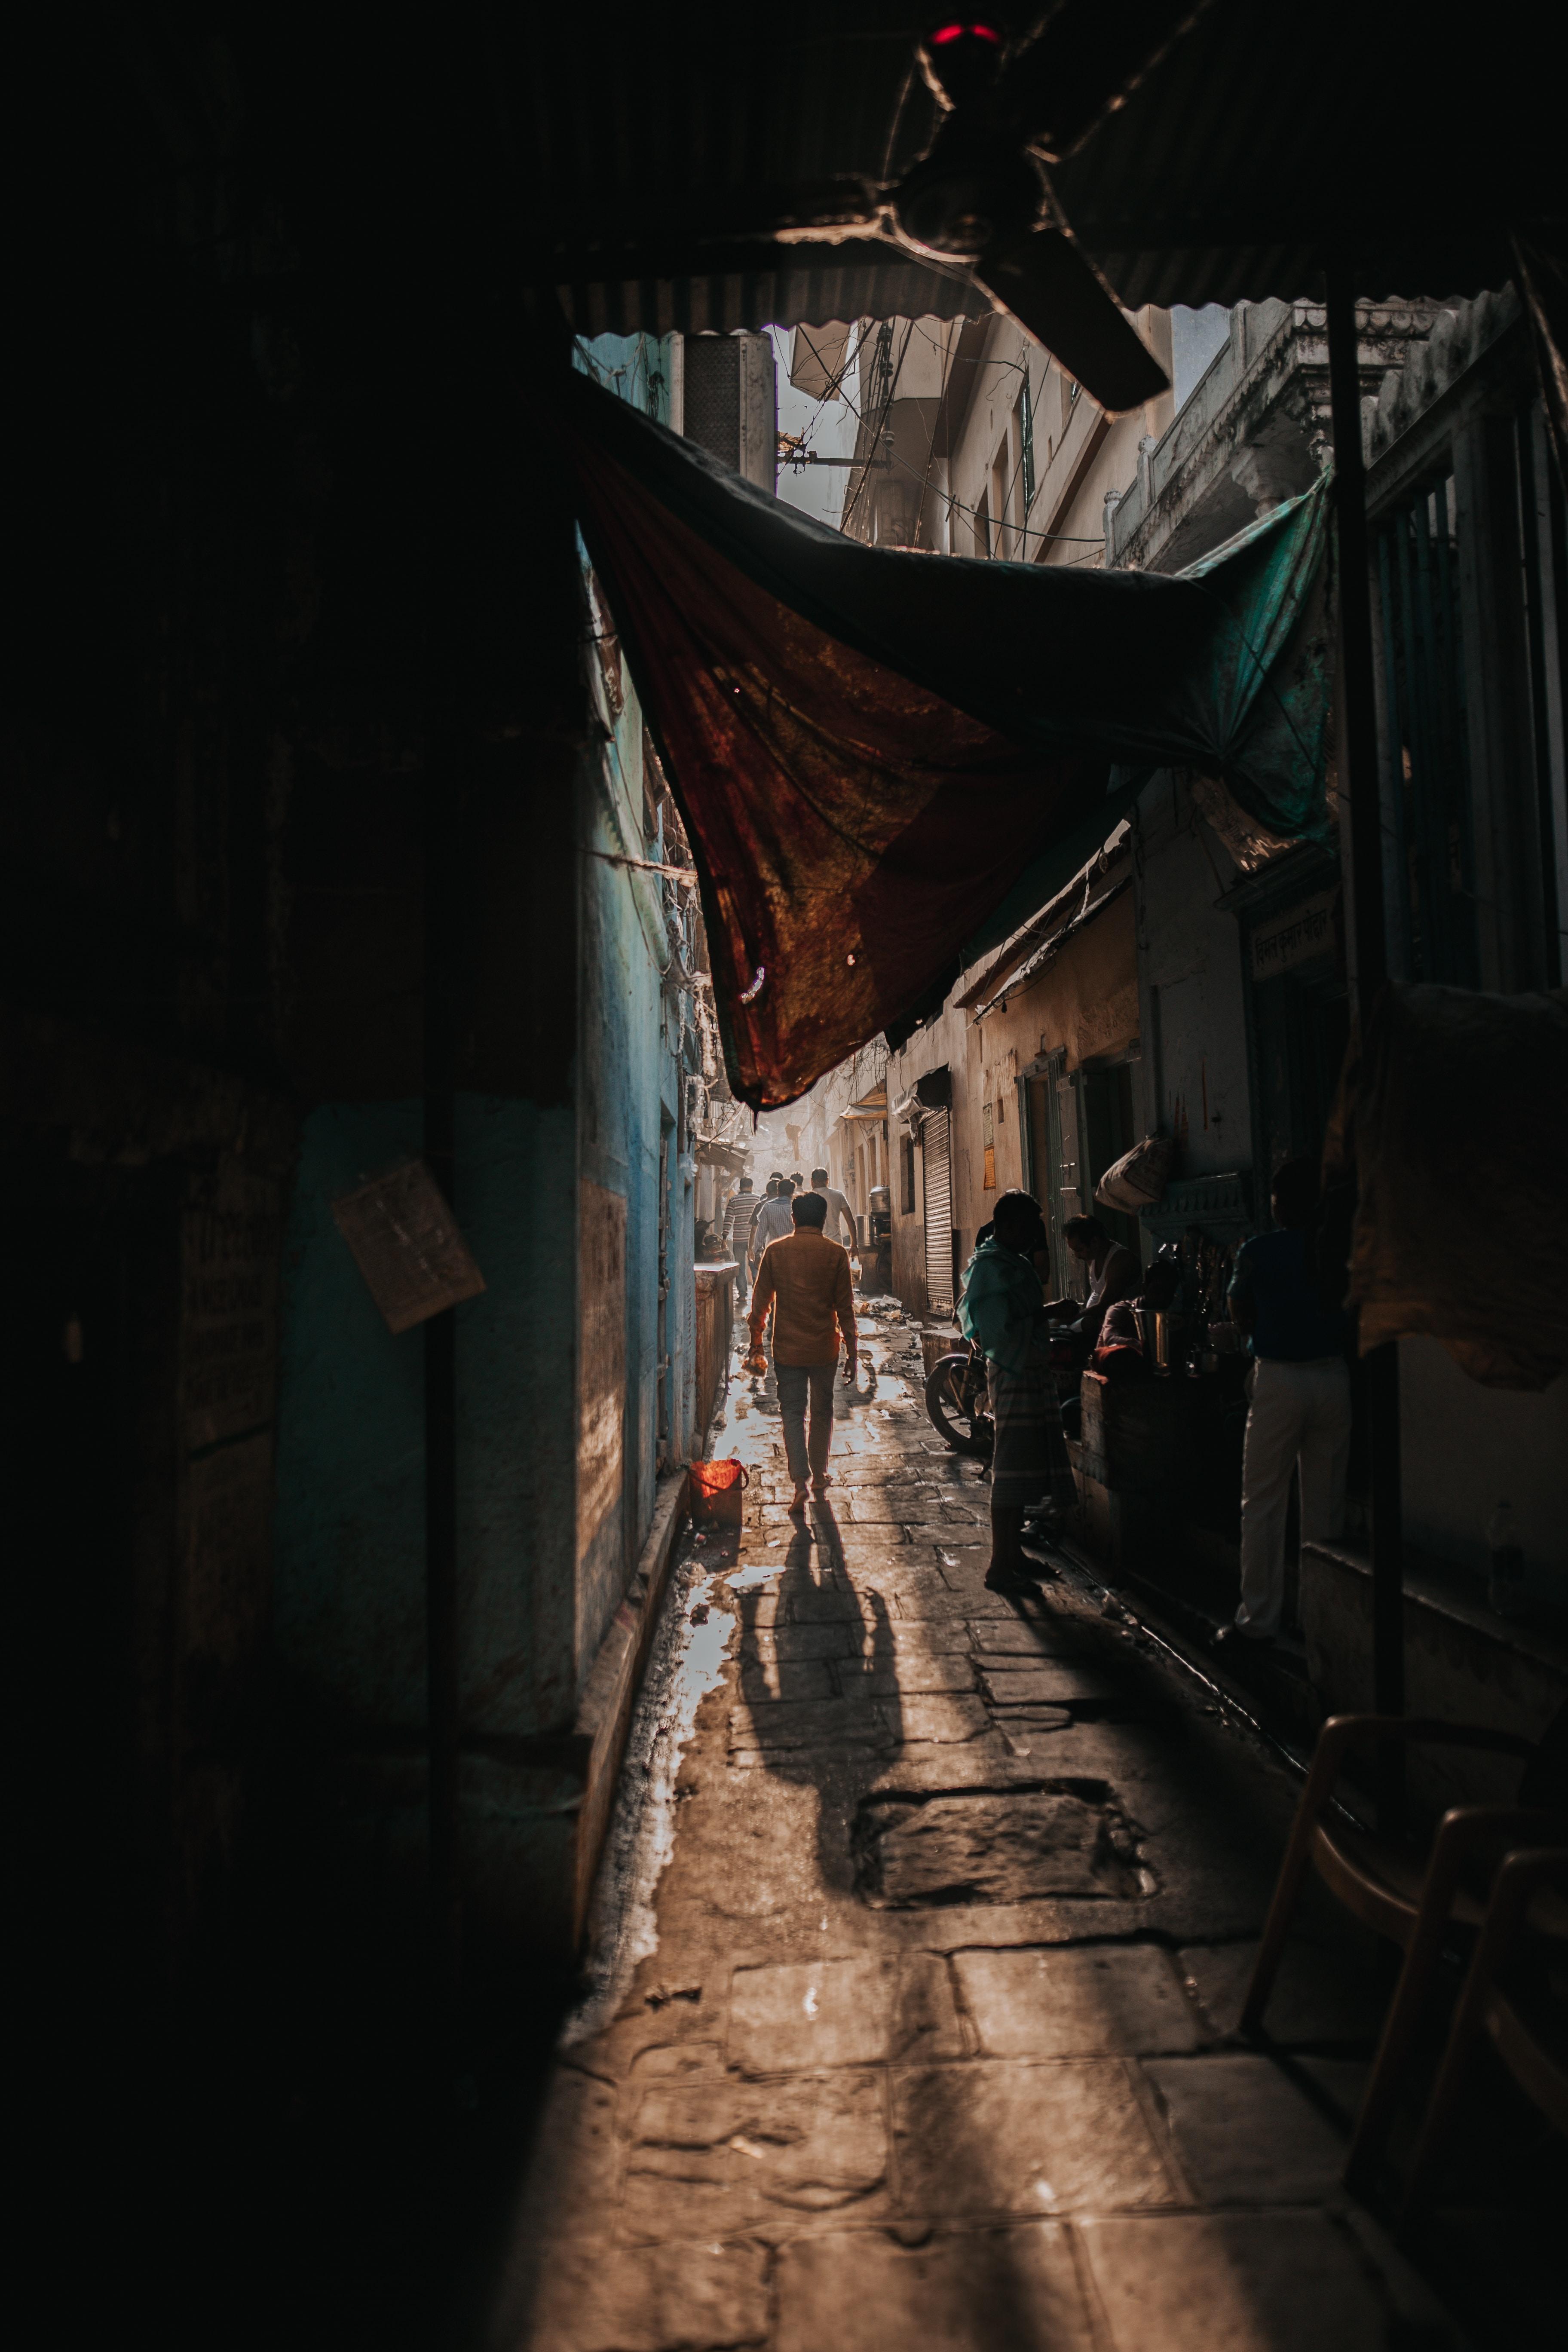 man walking on pathway between houses